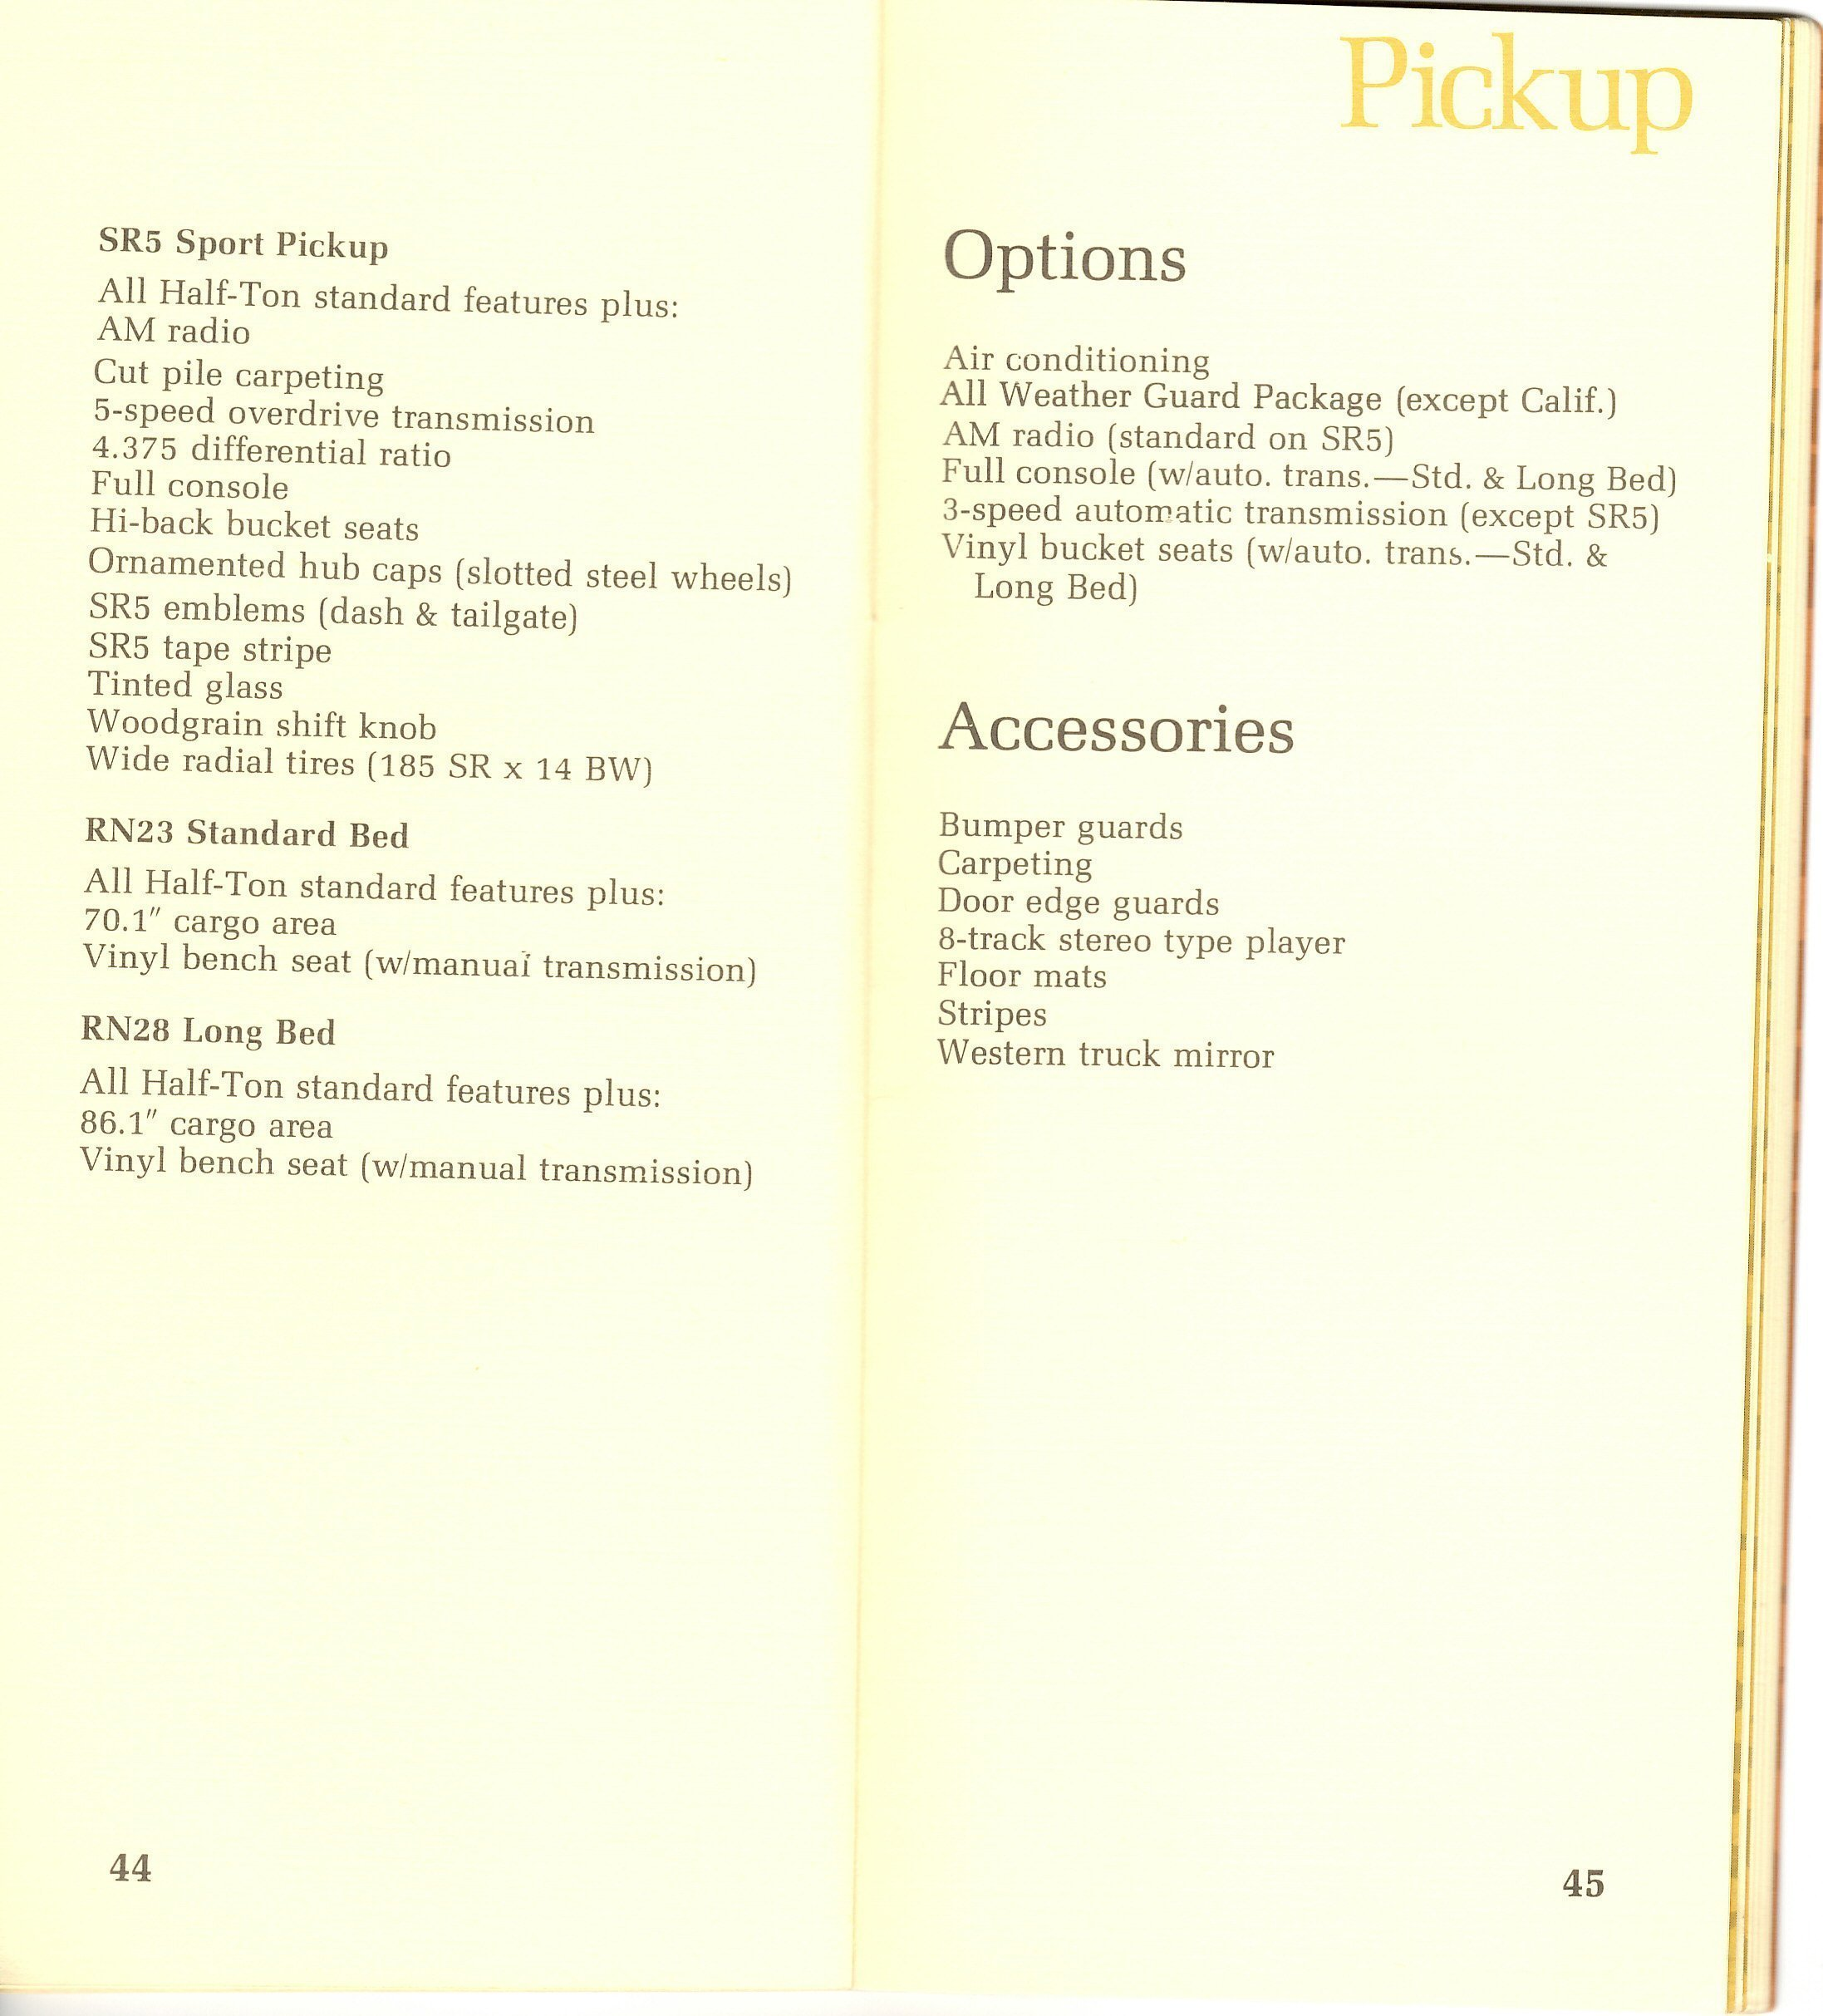 Page 44 & 45: FJ45 Specs